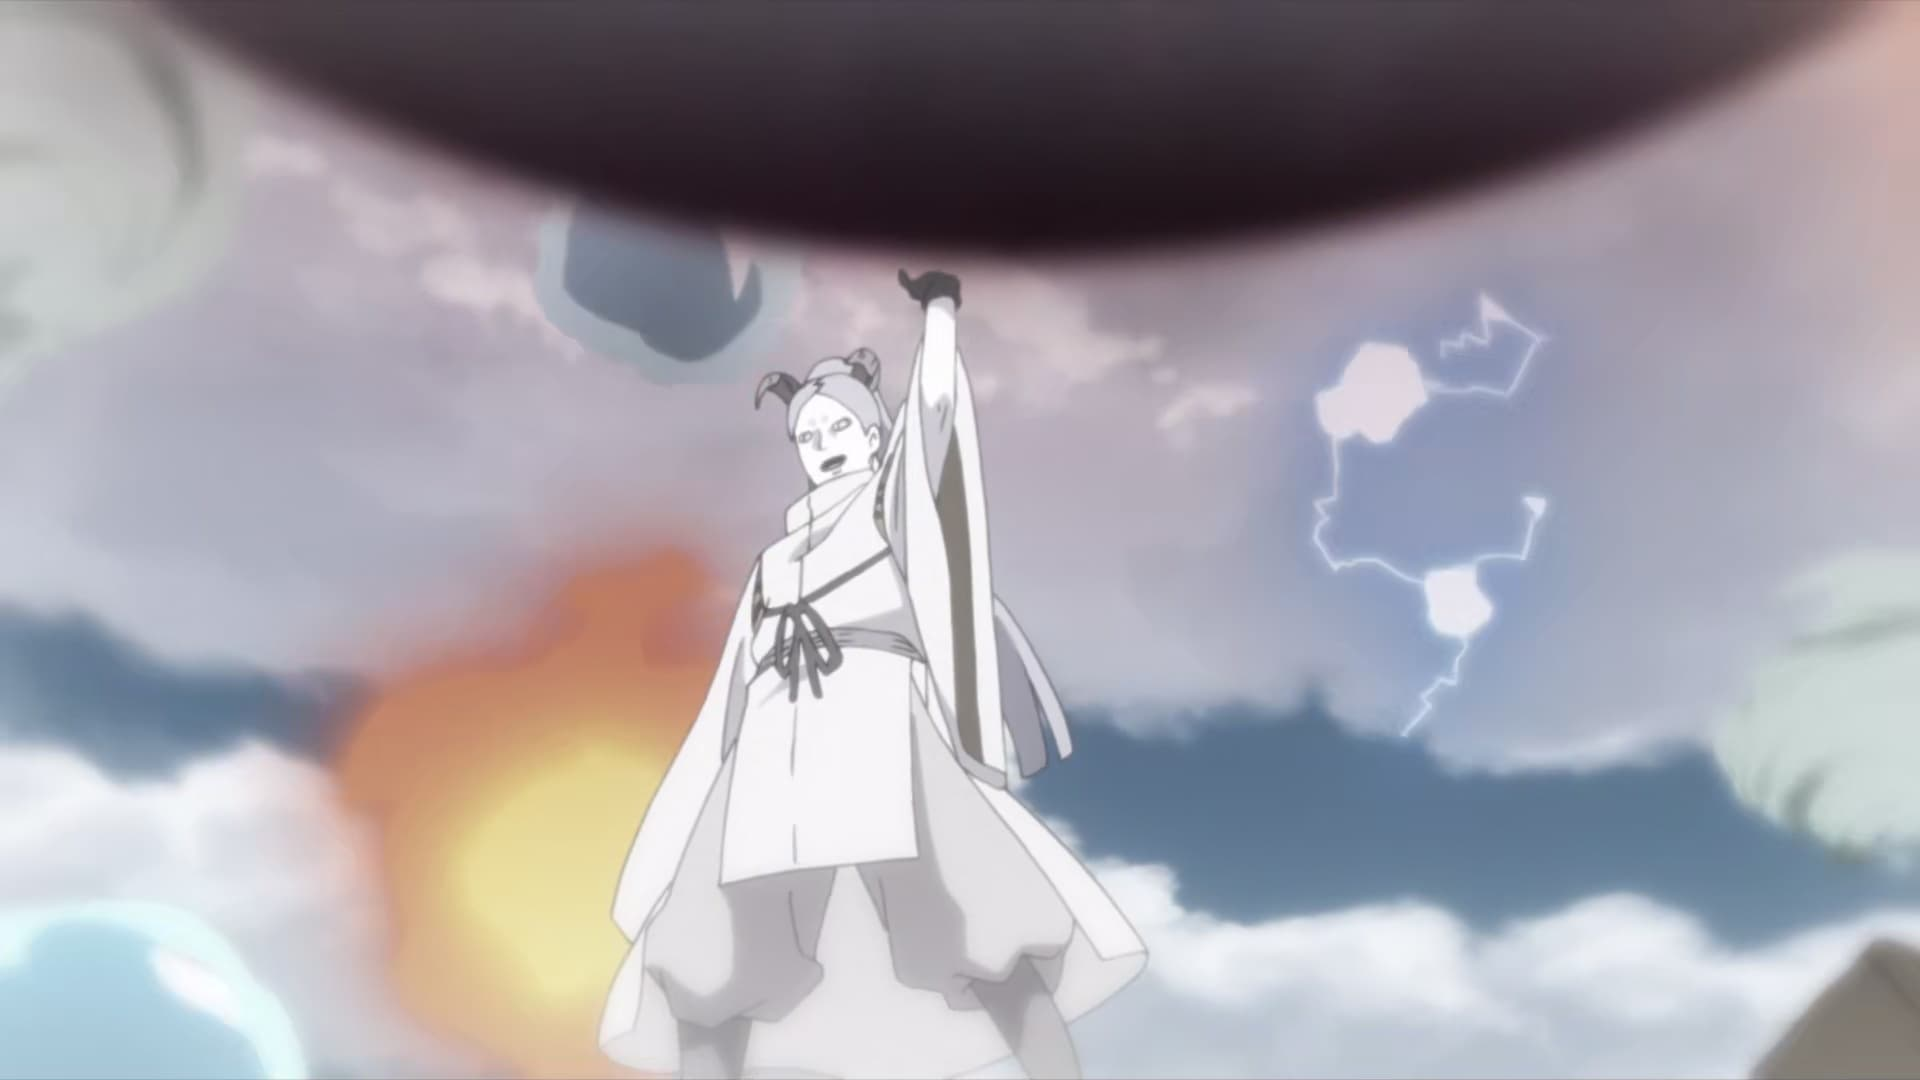 Boruto: Naruto Next Generations 181 Sub español - SuperGoku